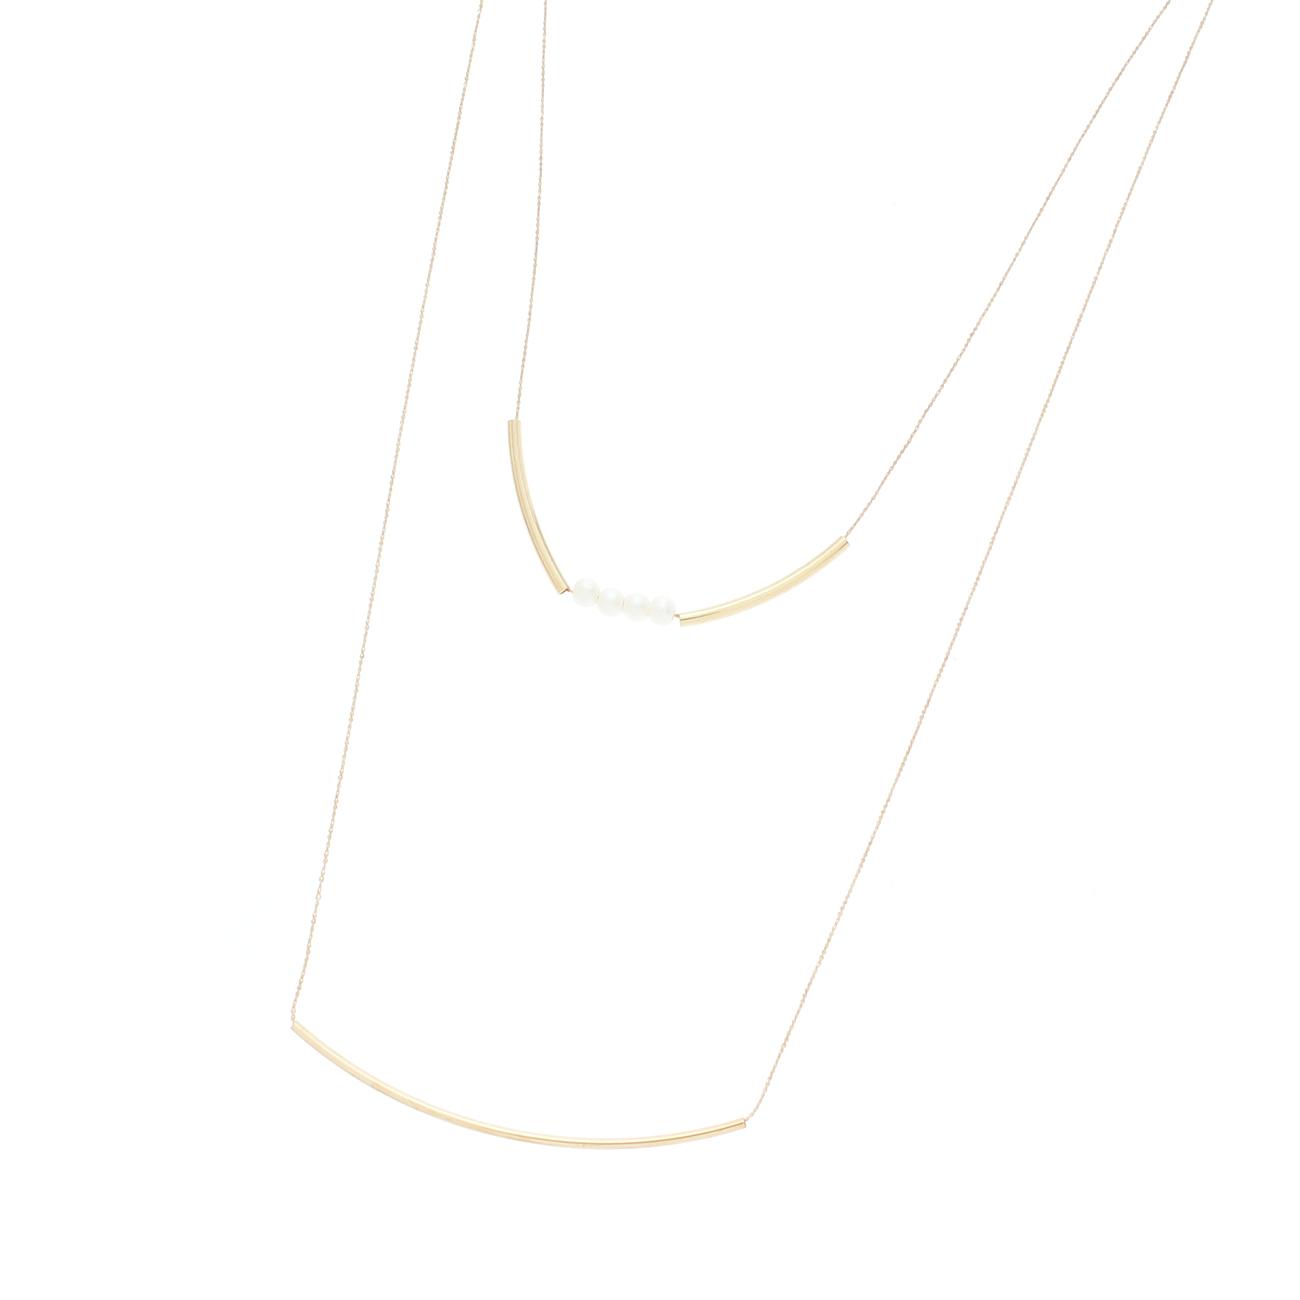 【OPAQUE.CLIP (オペークドットクリップ)】バーデザイン2連ネックレスレディース アクセサリー|ネックレス ゴールド